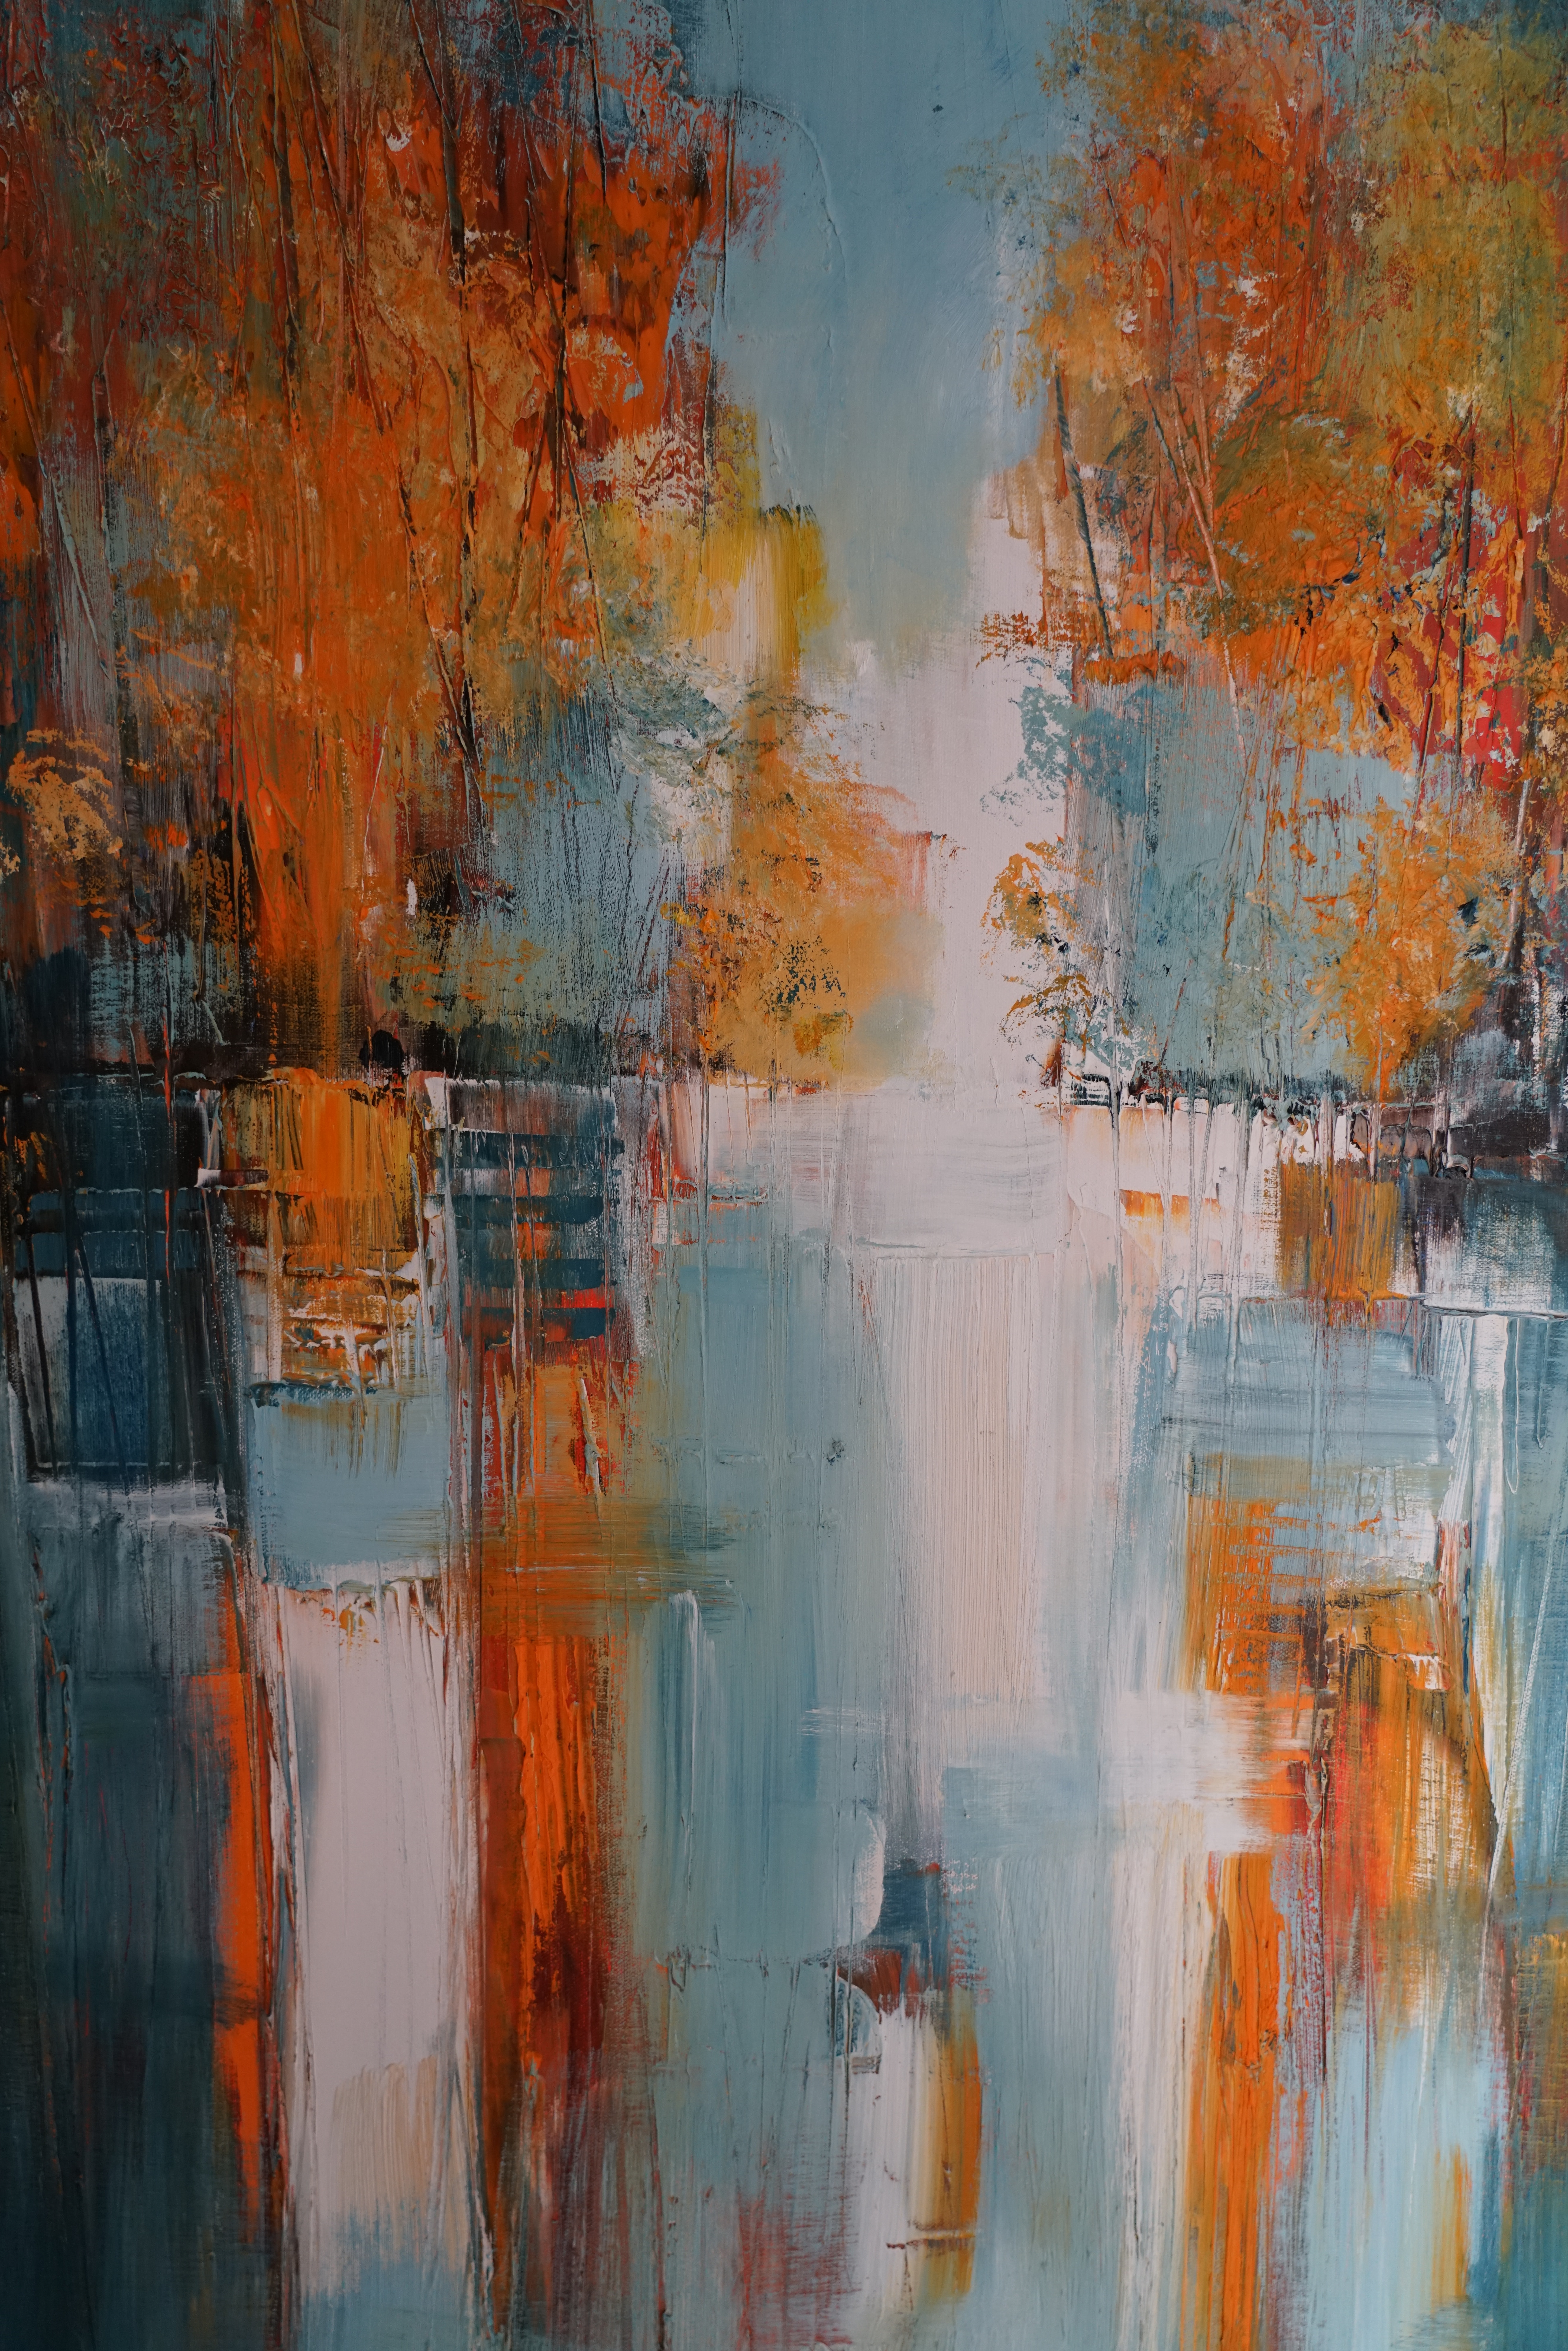 57404 baixar papel de parede Abstrato, Multicolorido, Motley, Textura, Pintar, Traços, Esfregaços - protetores de tela e imagens gratuitamente